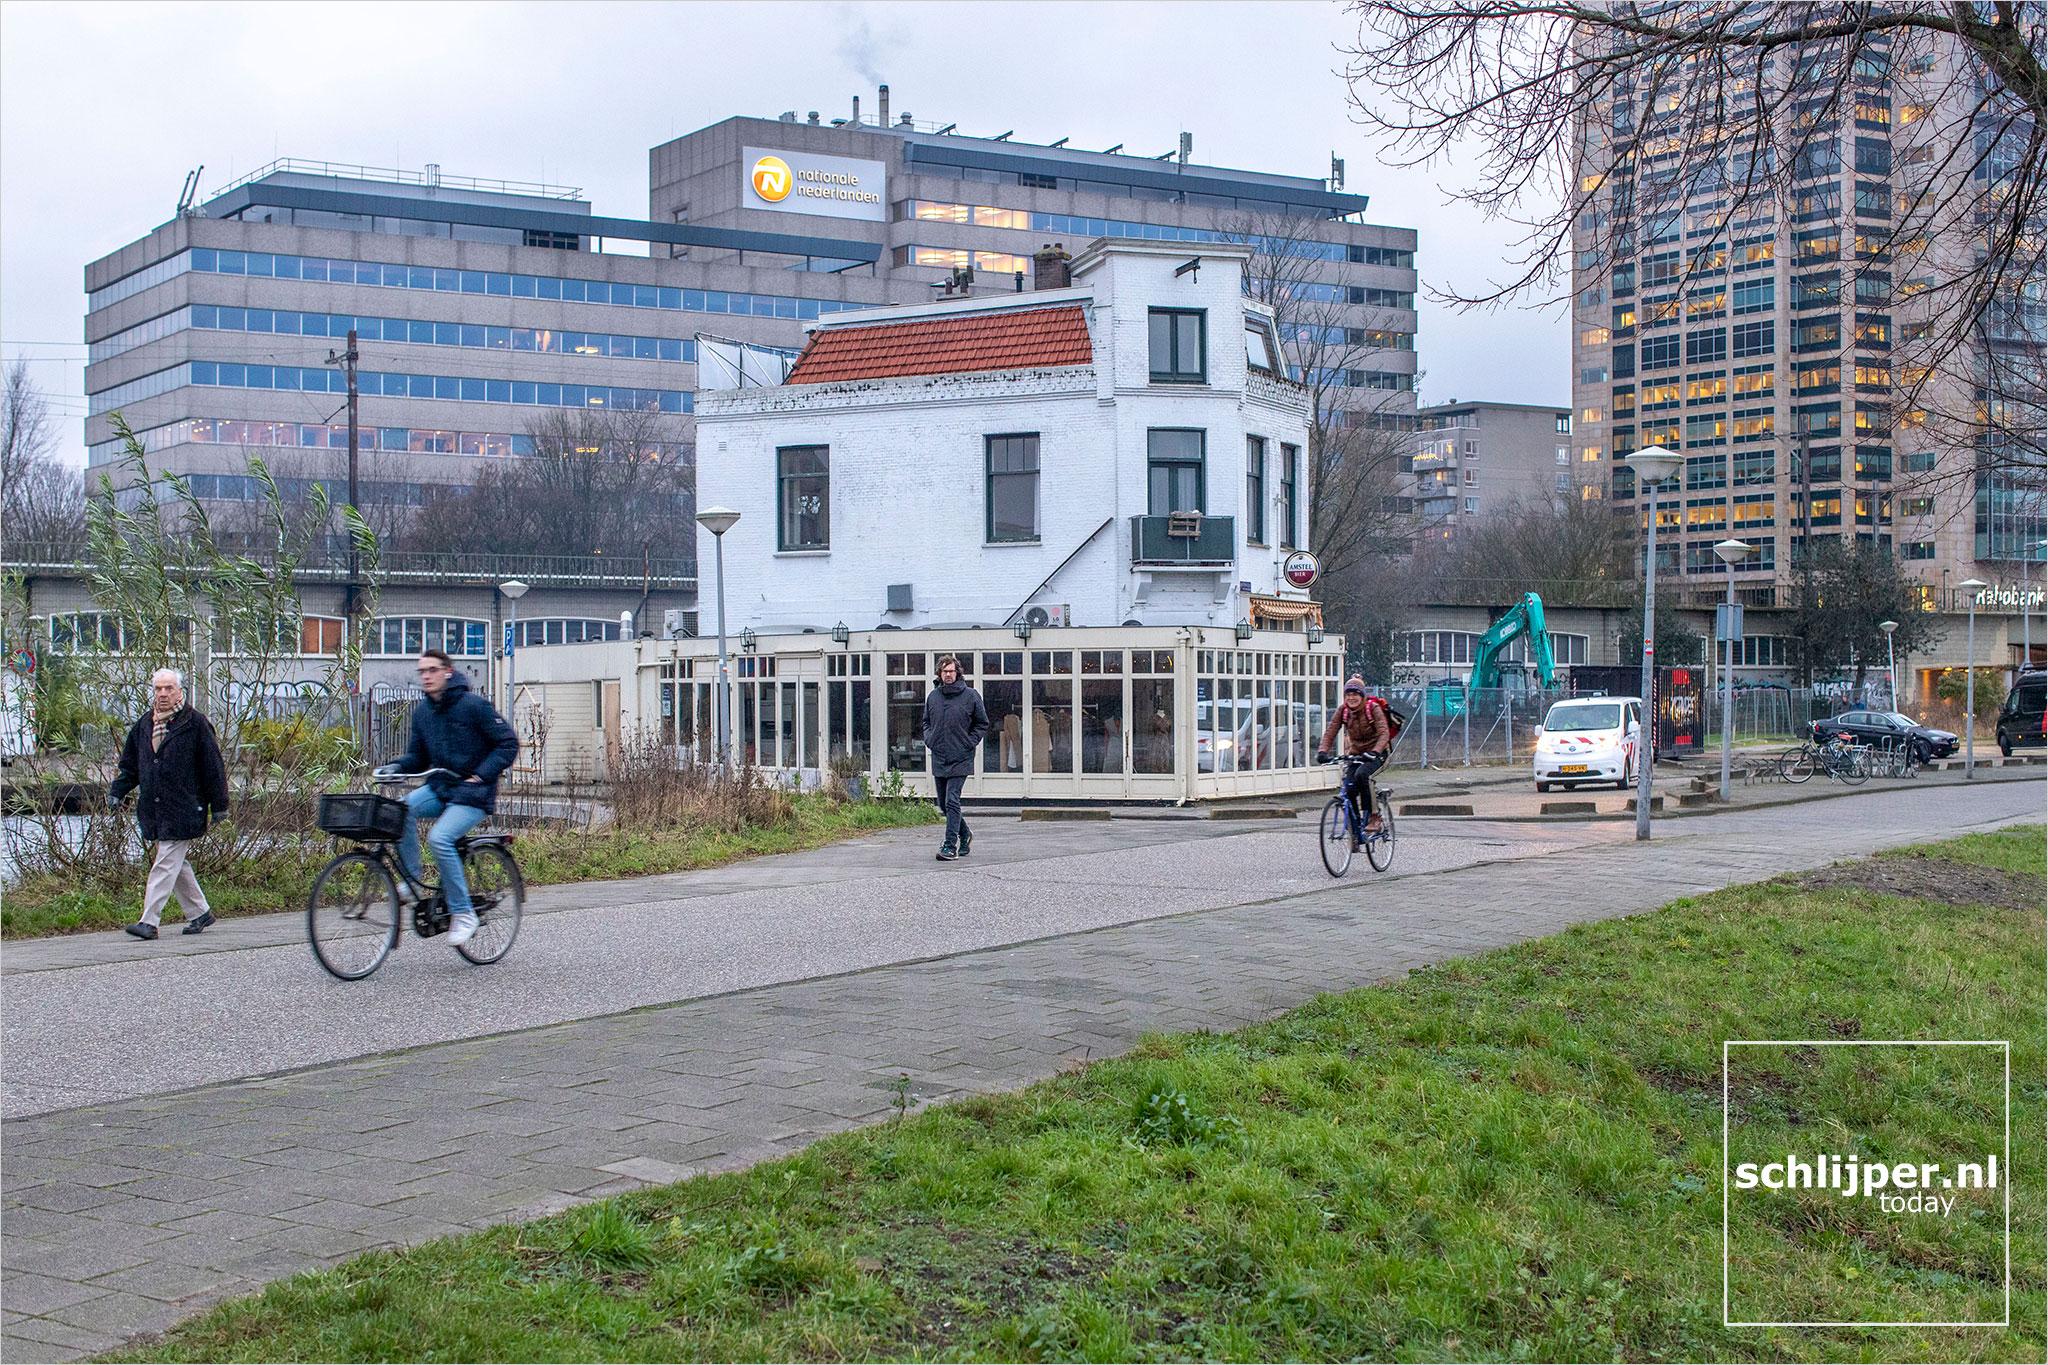 The Netherlands, Amsterdam, 5 januari 2021